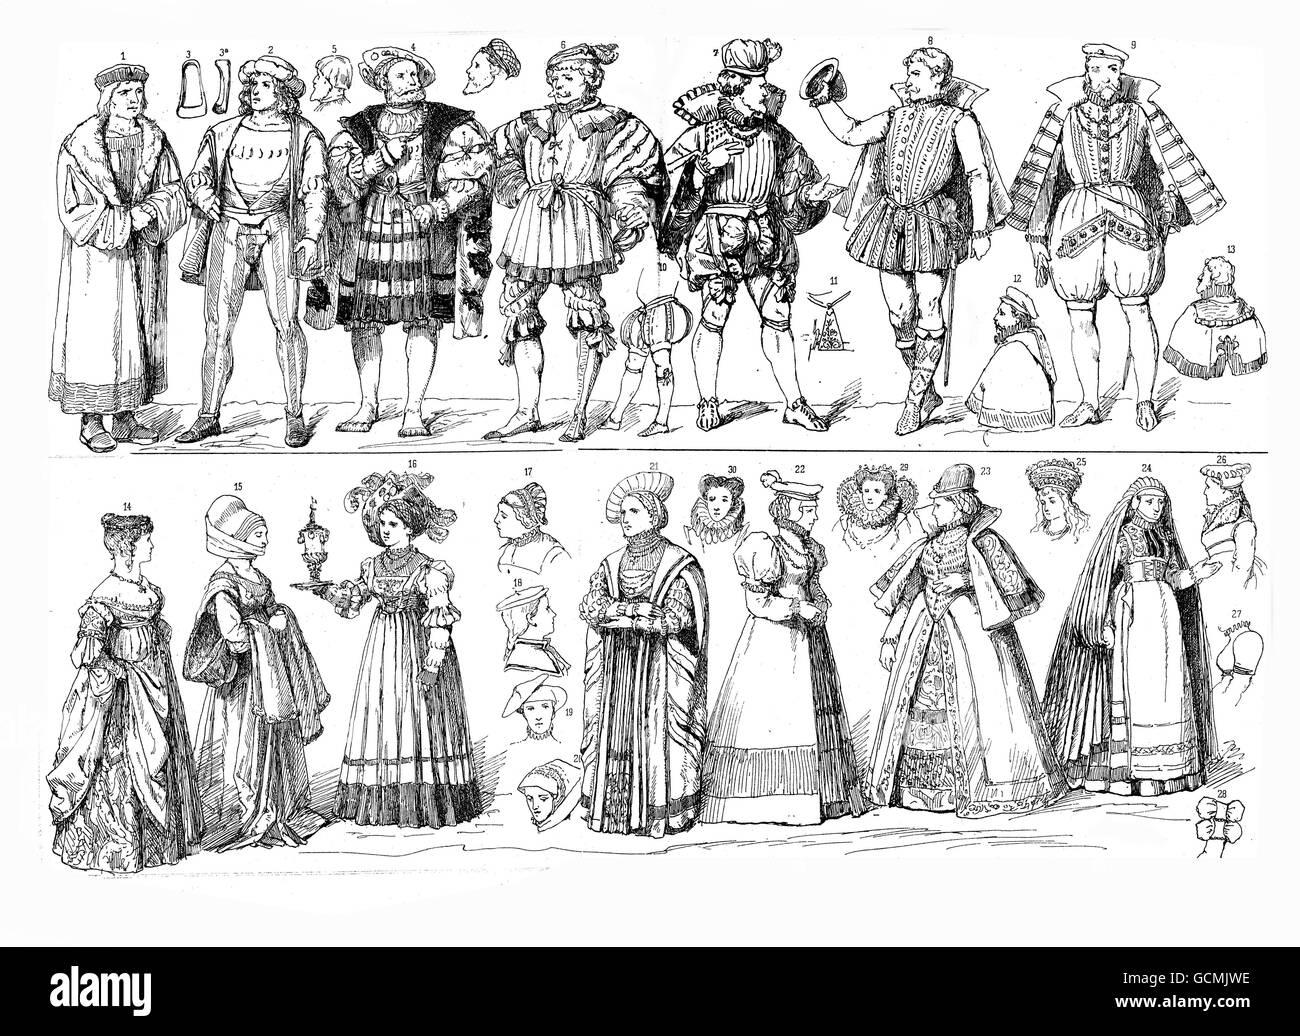 XVI century, German Renaissance upper class clothing - Stock Image